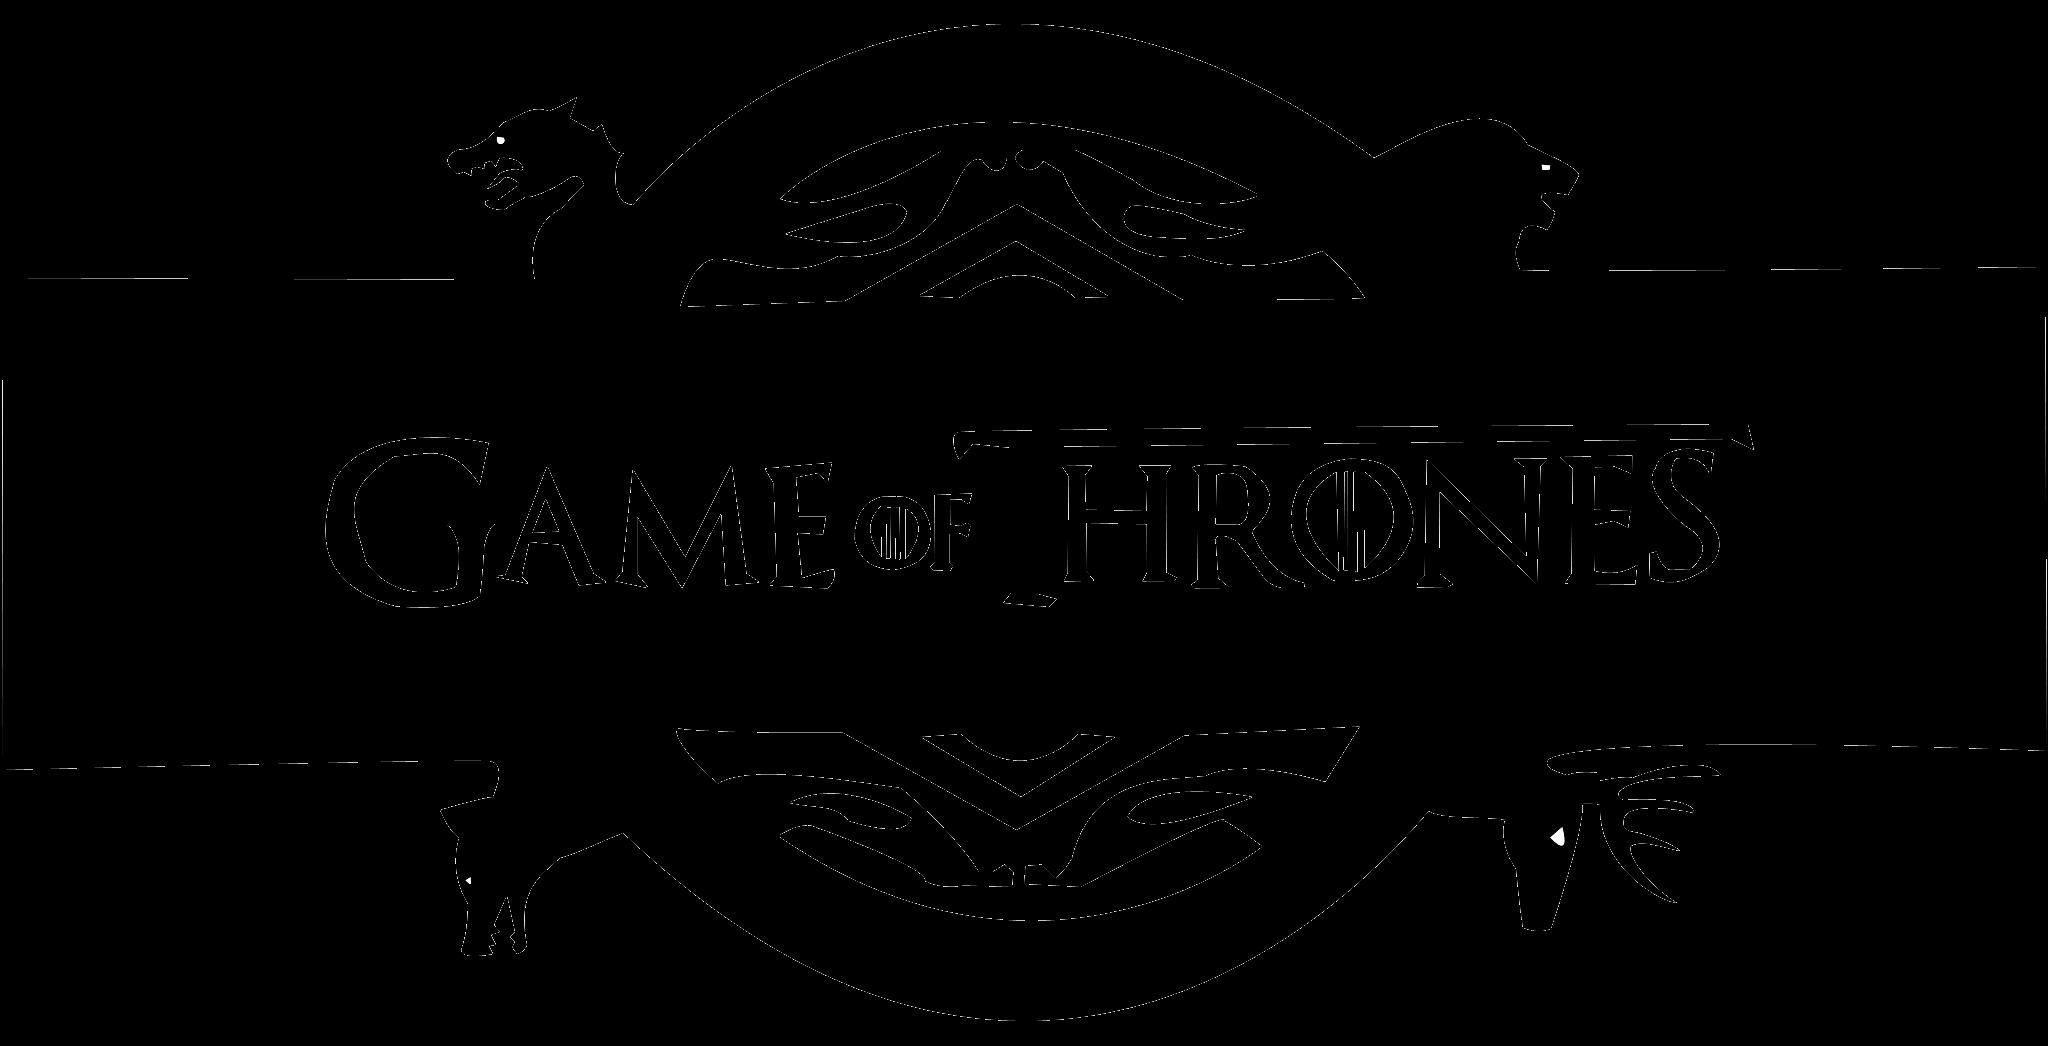 Daenerys Targaryen Winter Is Coming Stencil Cersei Lannister House.